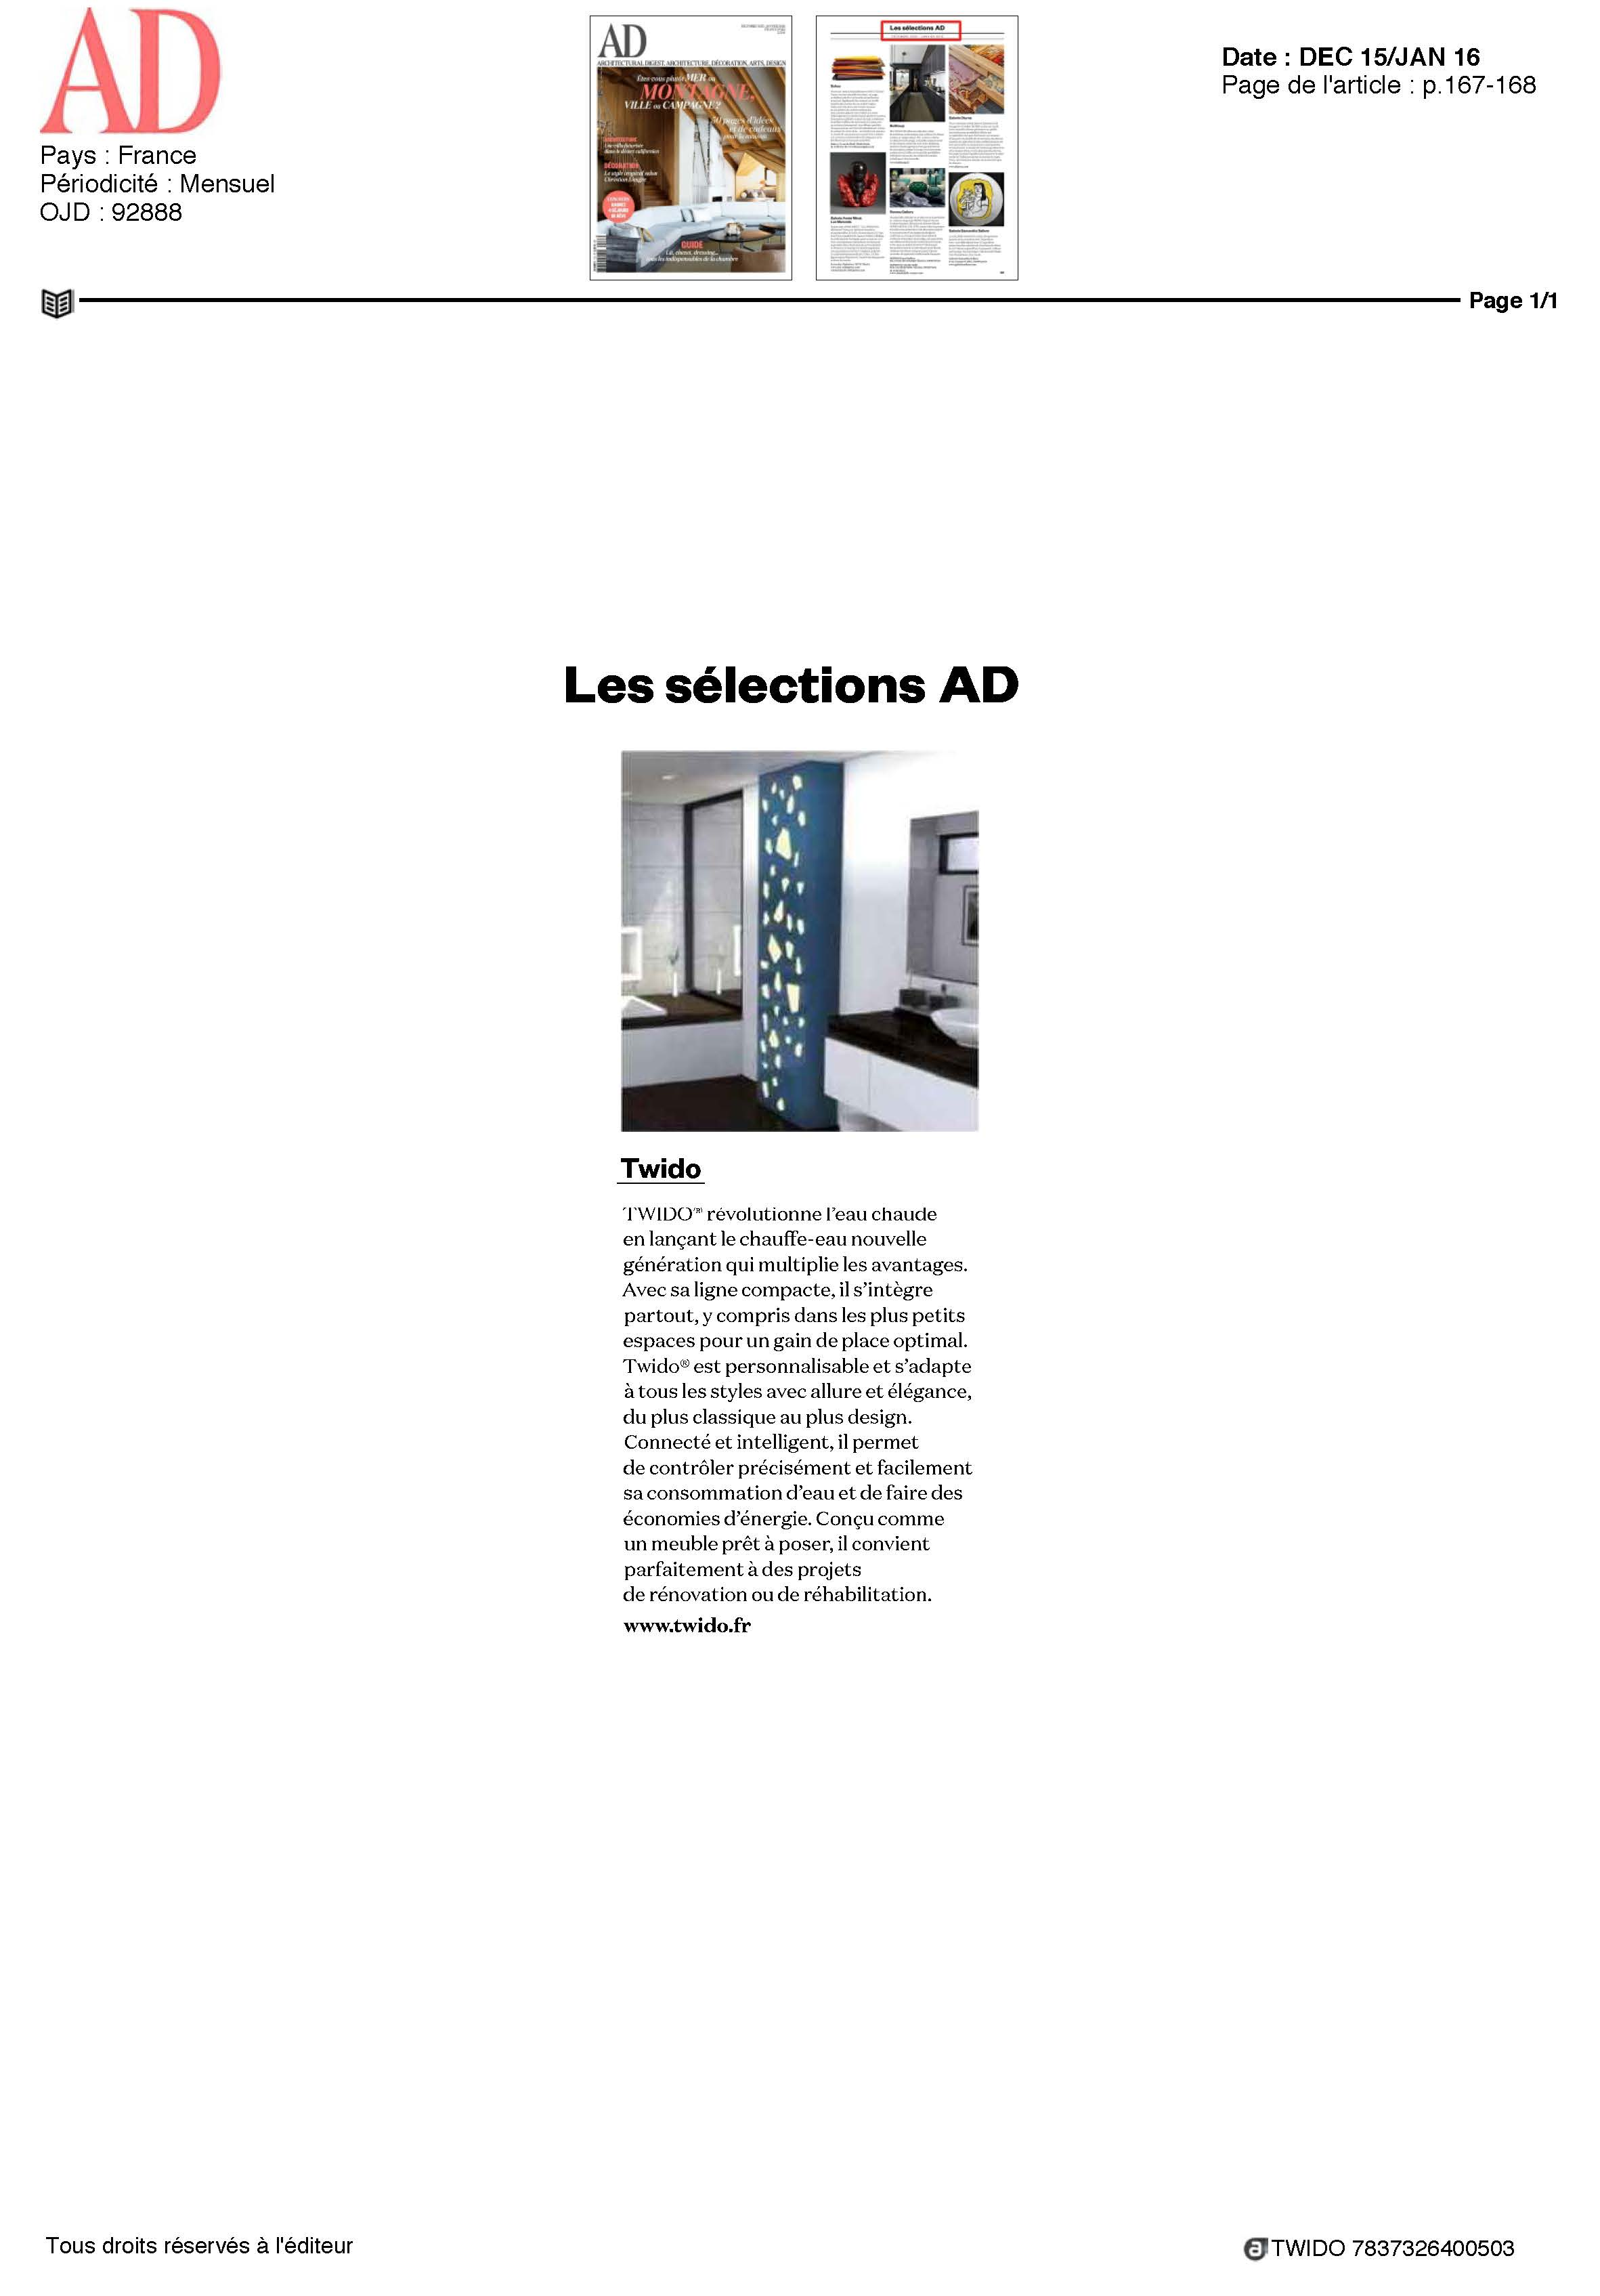 AD selectionne Twido